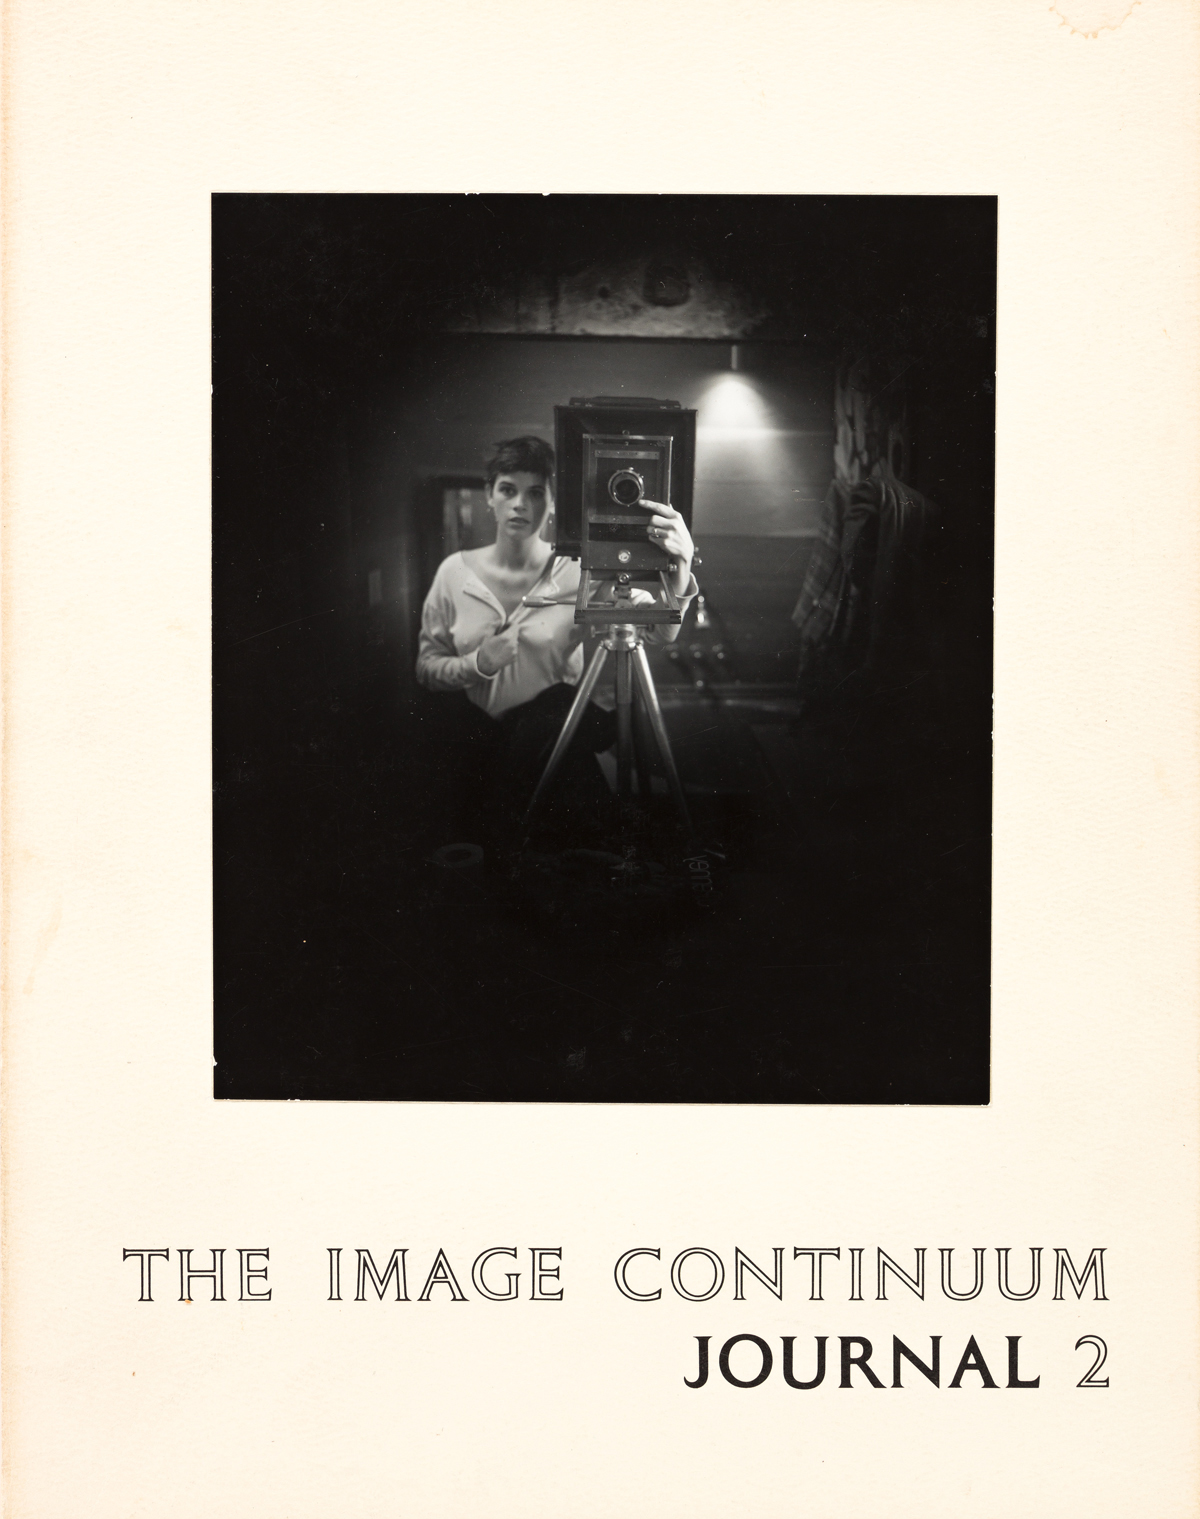 (SALLY MANN, TED ORGAN, DAVID BAYLES, et alia.) The Image Continuum Journal 2.